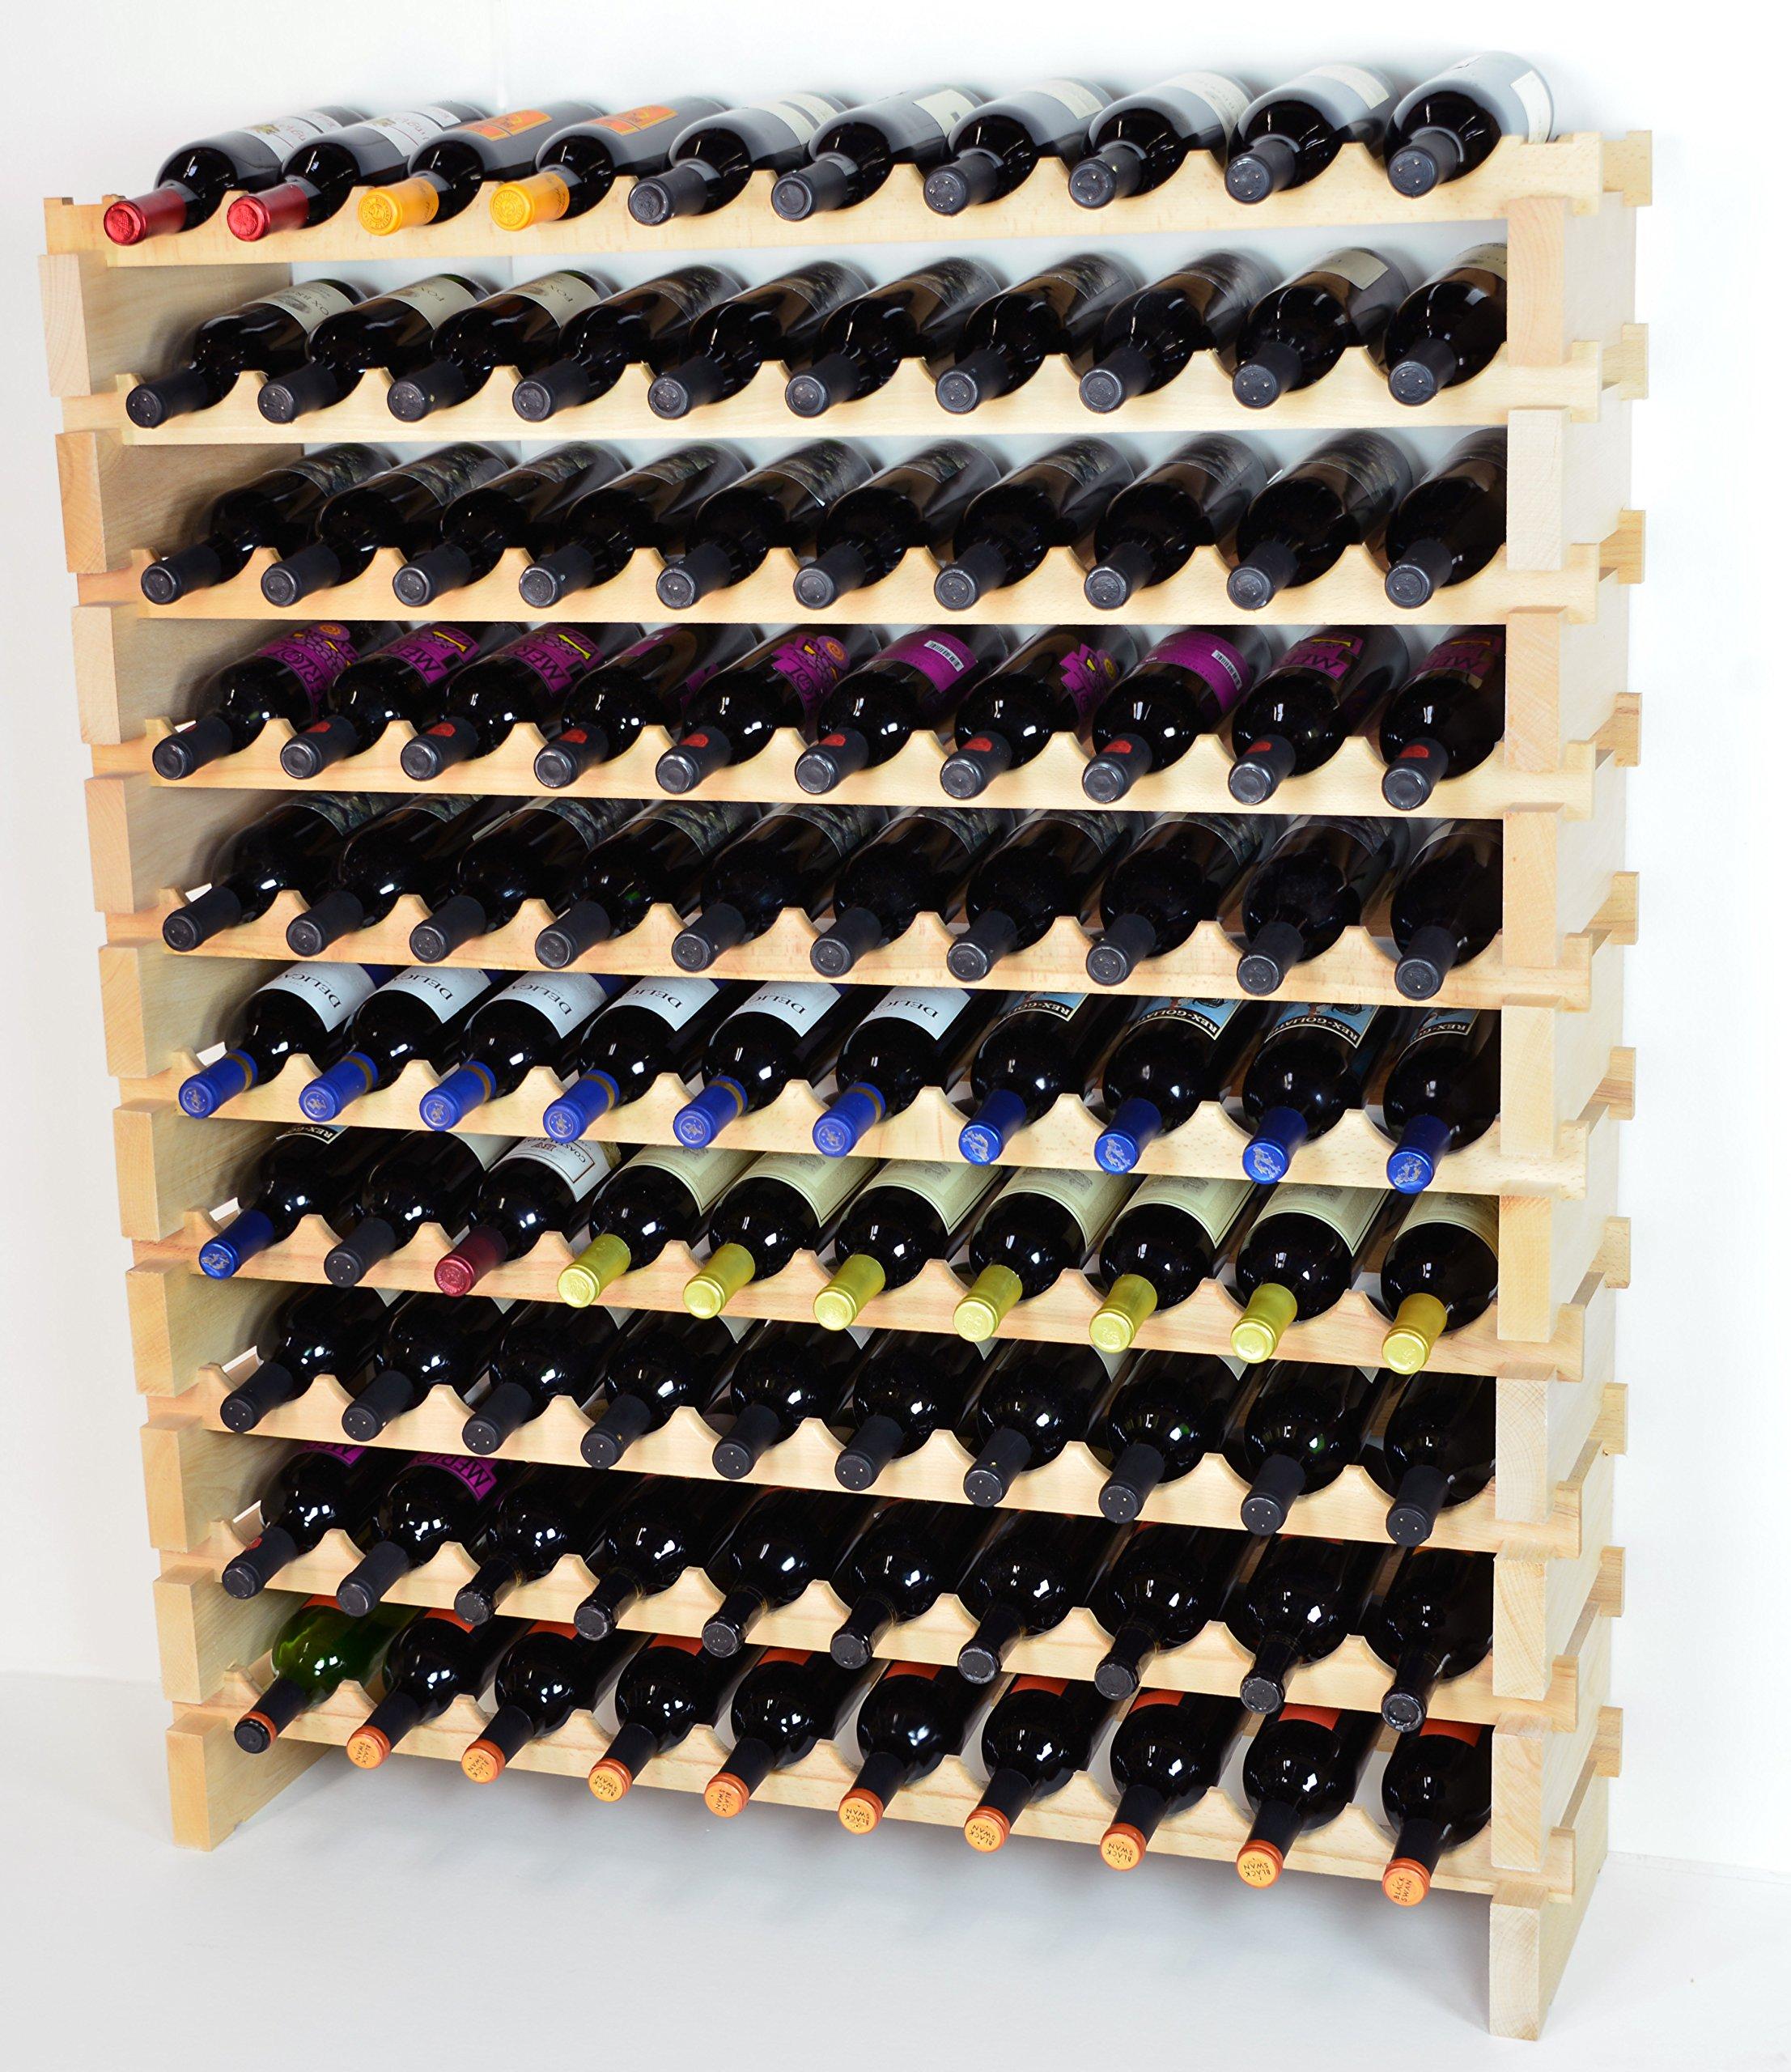 Modular Wine Rack Beechwood 40-120 Bottle Capacity 10 Bottles Across up to 12 Rows Newest Improved Model (100 Bottle - 10 Rows)